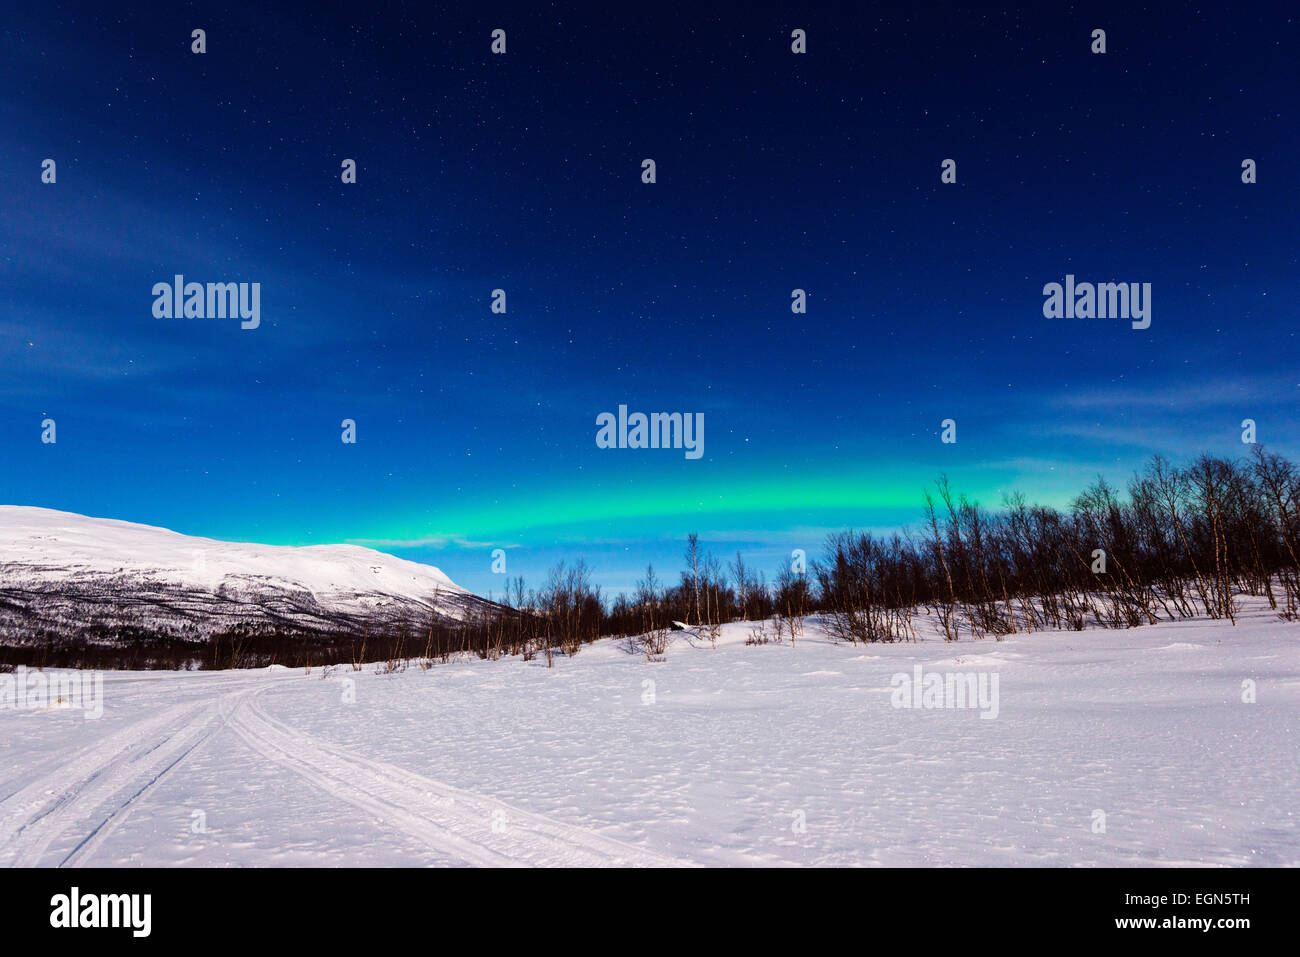 Arctic cirlcle, Europe, Lapland, Scandinavia,  Sweden, Abisko National Park,  aurora borealis, northern lights - Stock Image